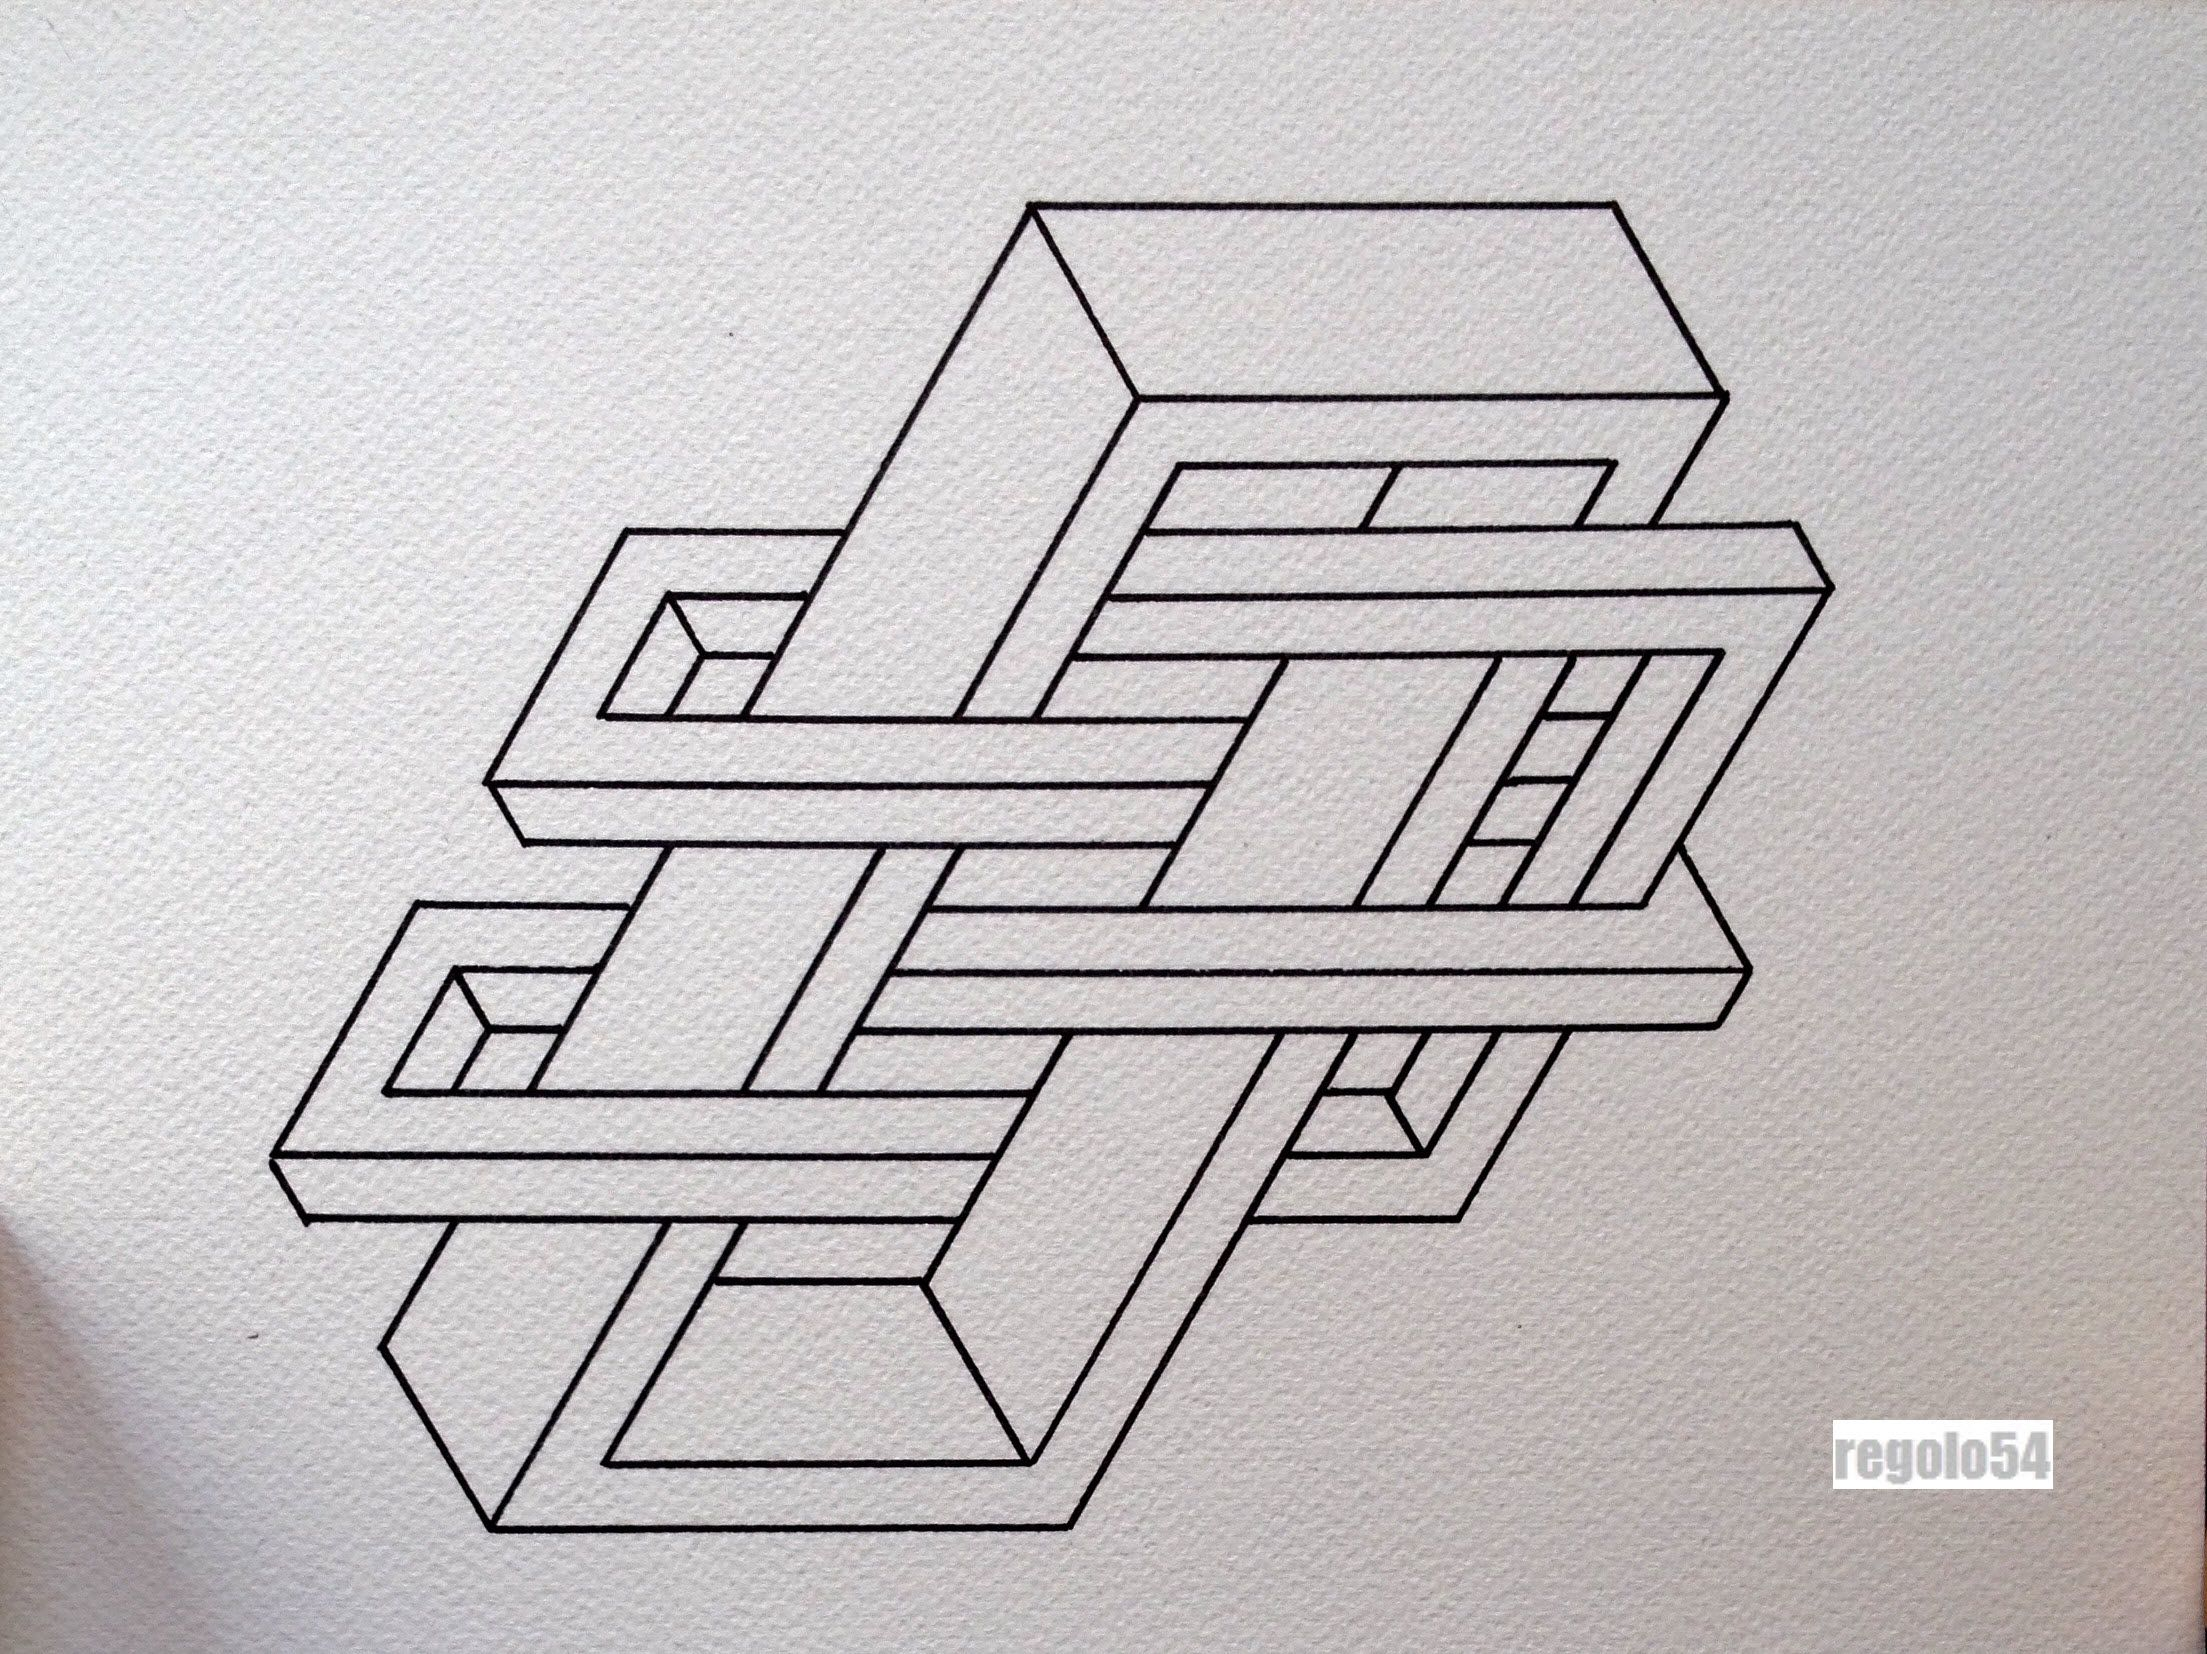 Regolo54 Impossible Isometric Penrosetriangle Oscar Reutersward Symmetry Leer Tekenen Tekenen